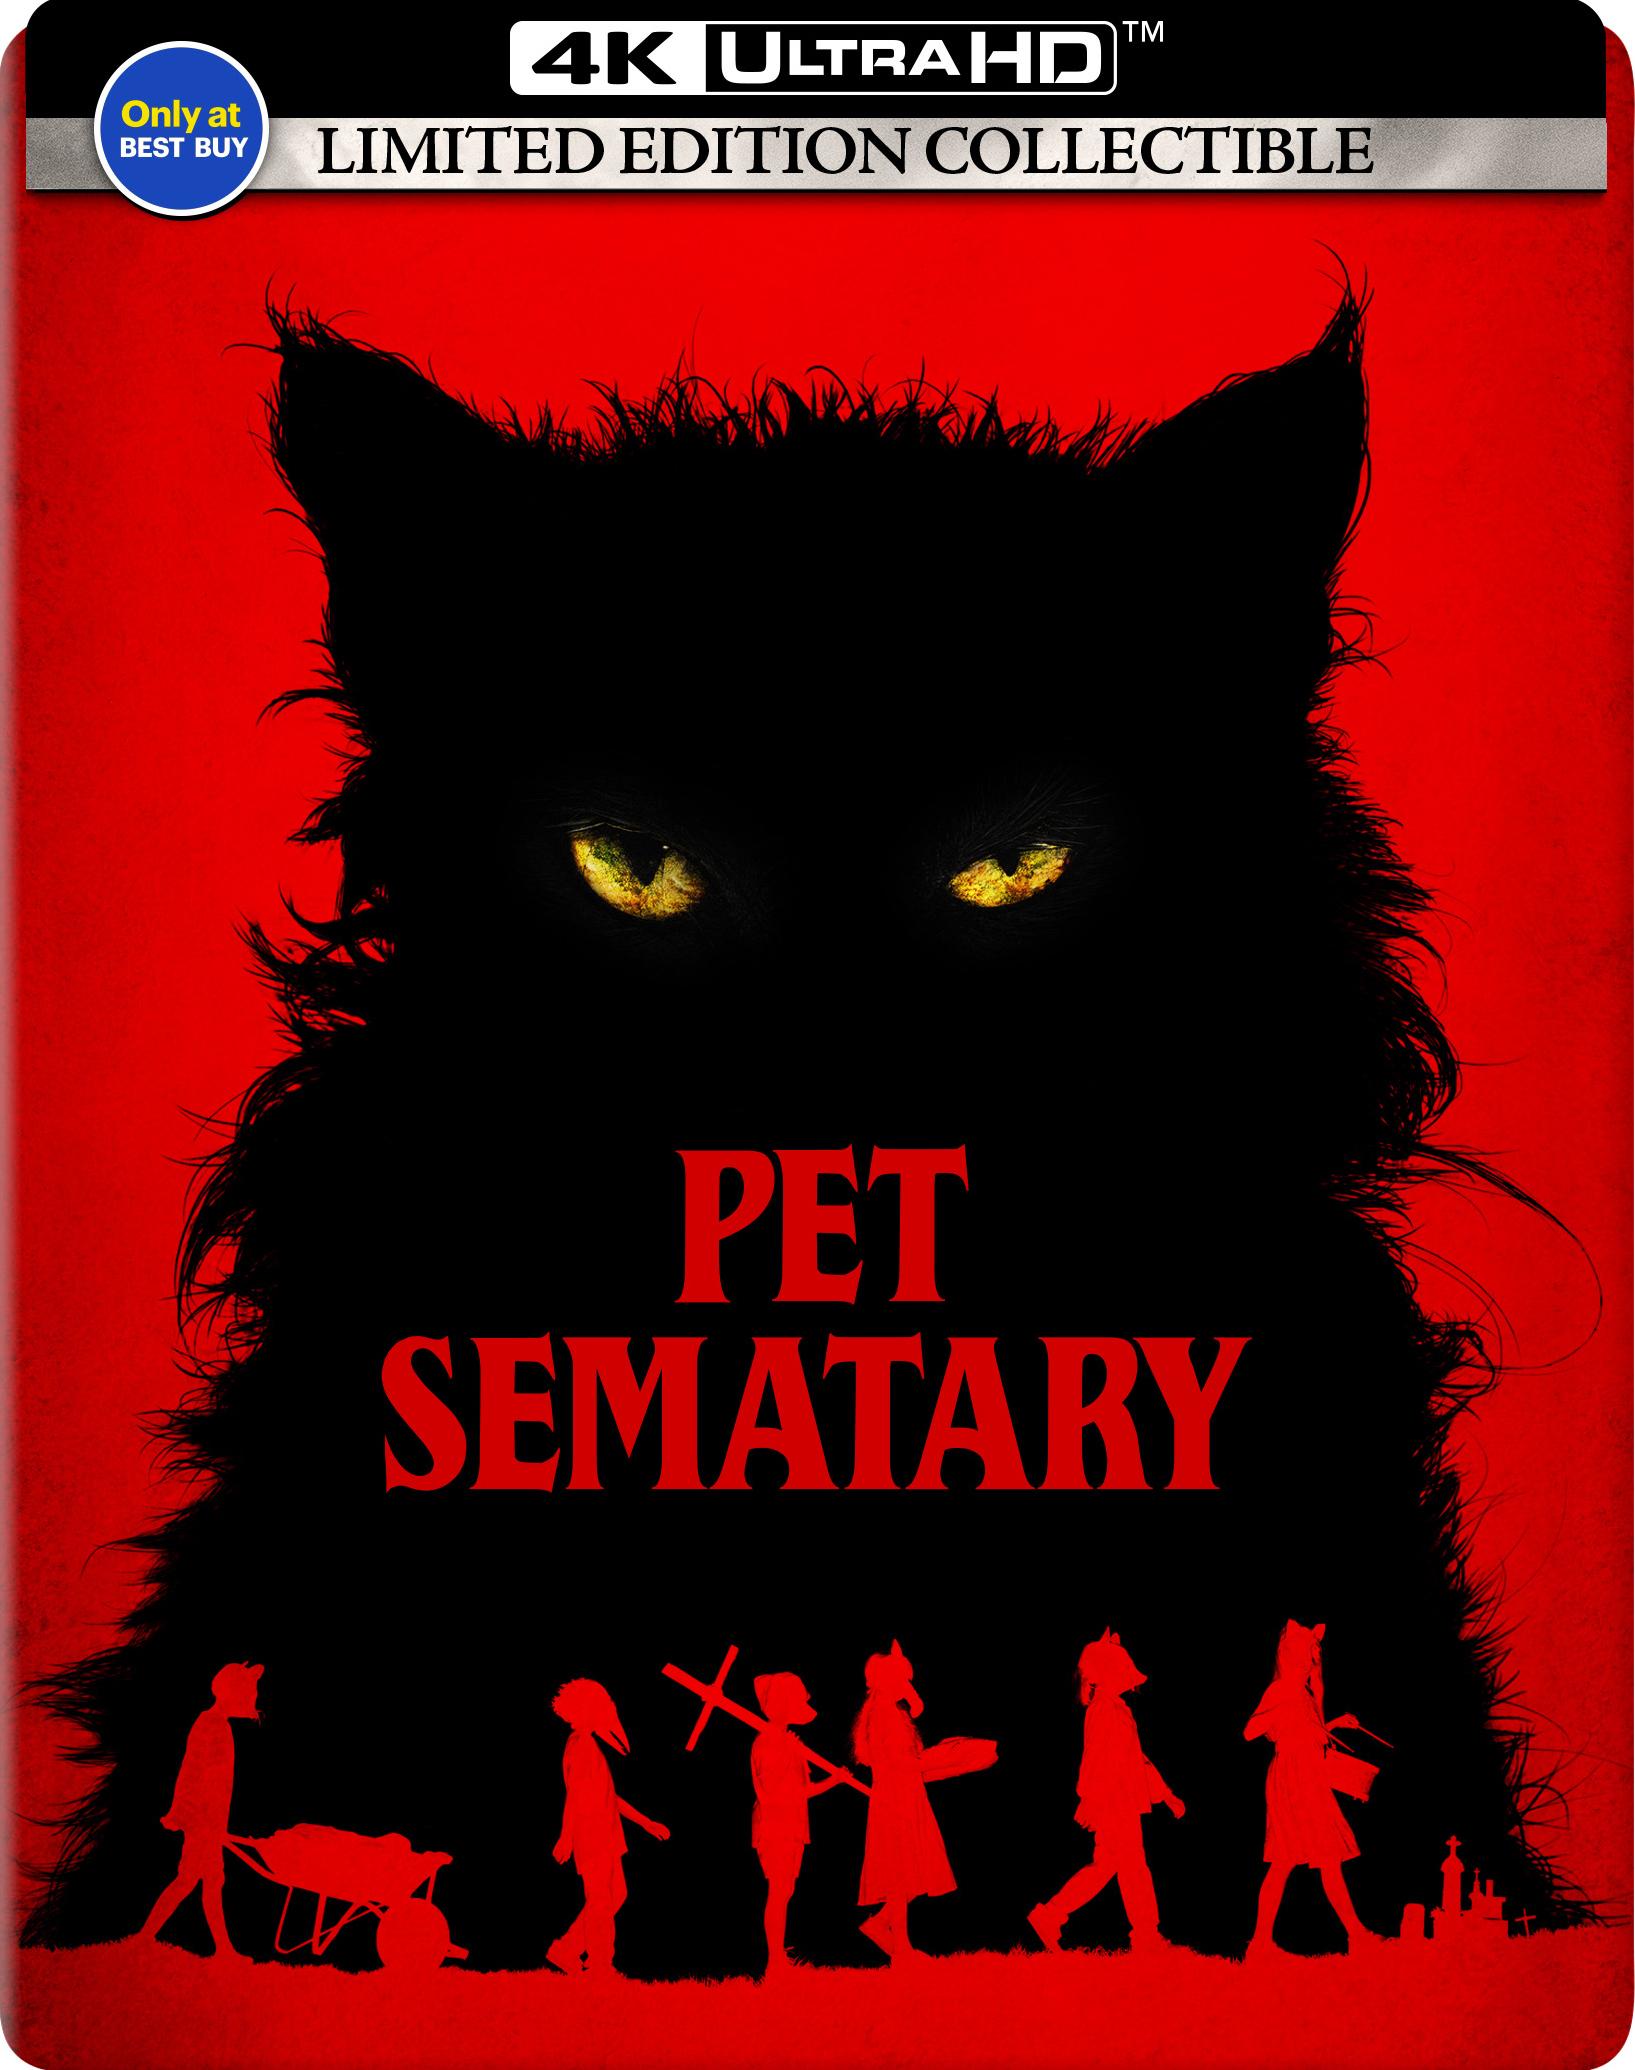 Pet Sematary (2019)(SteelBook)(4K Ultra HD Blu-ray)(Pre-order / TBA)